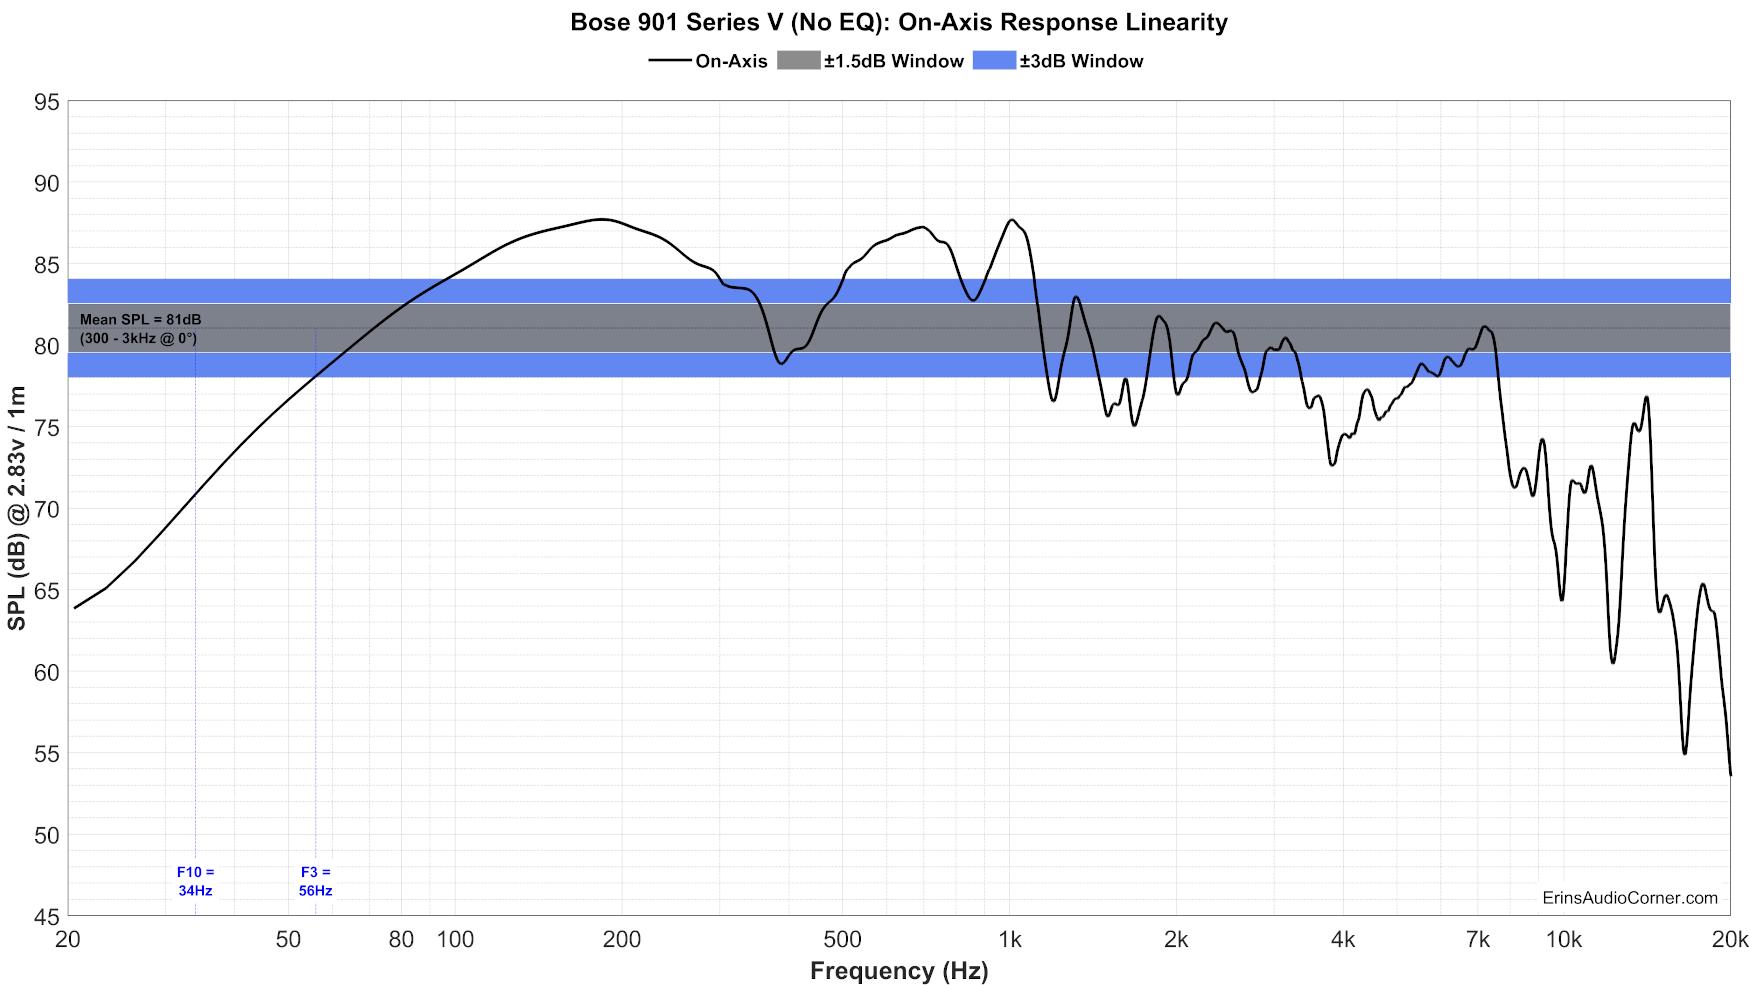 Bose%20901%20Series%20V%20(No%20EQ)%20FR_Linearity.png